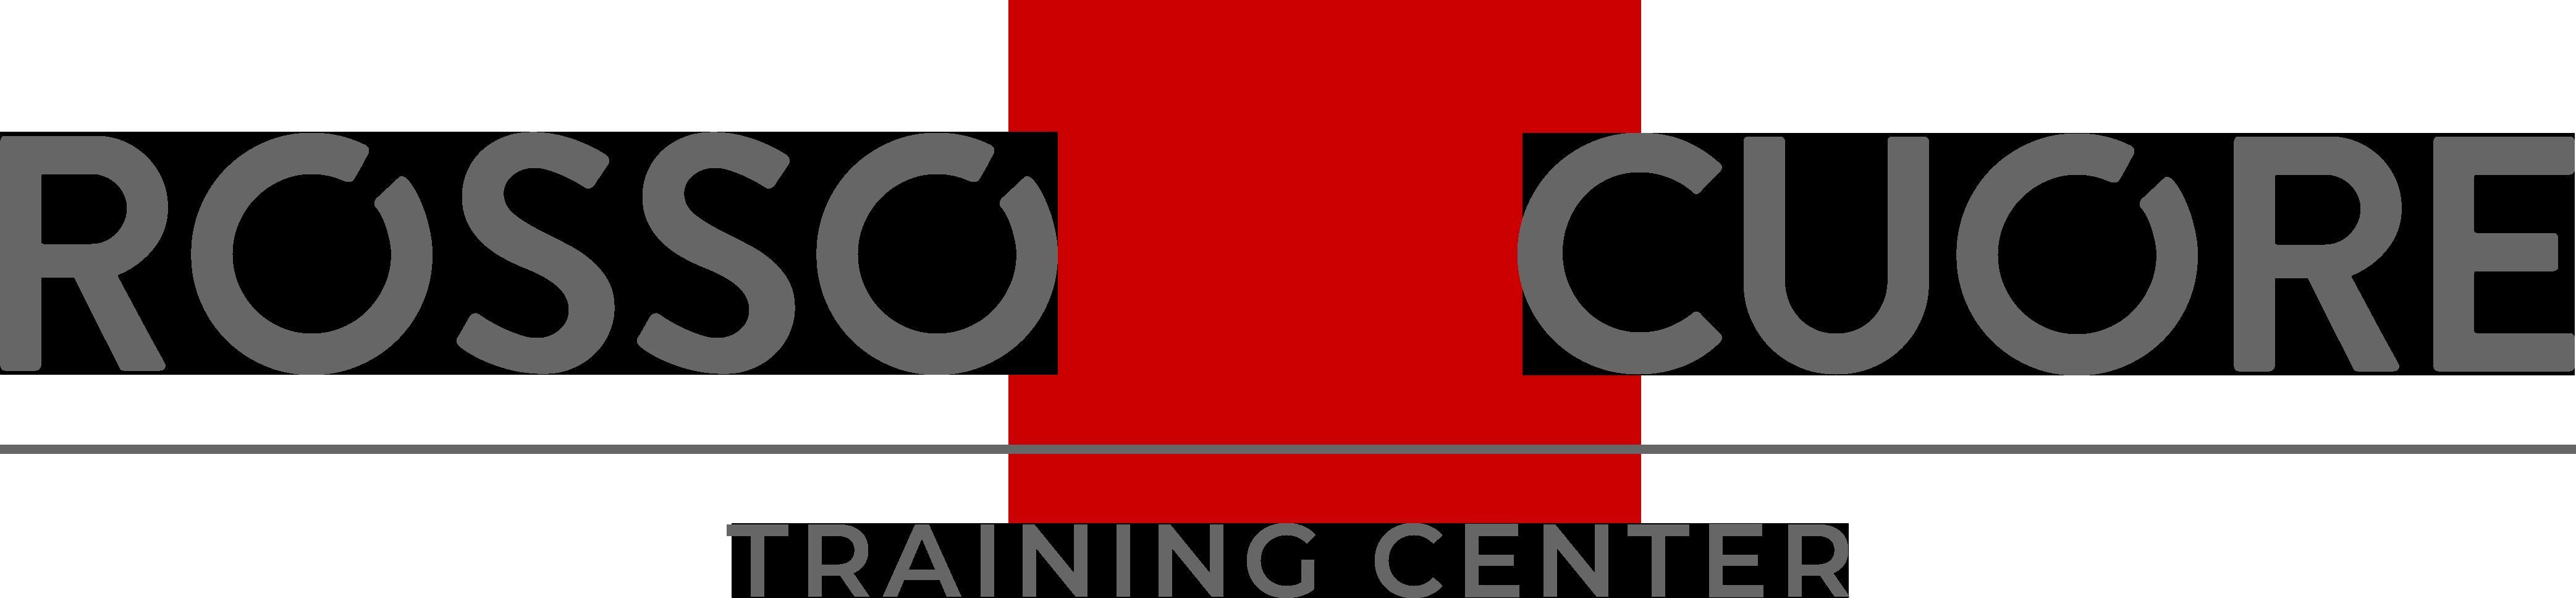 ROSSOCUORE Training Center